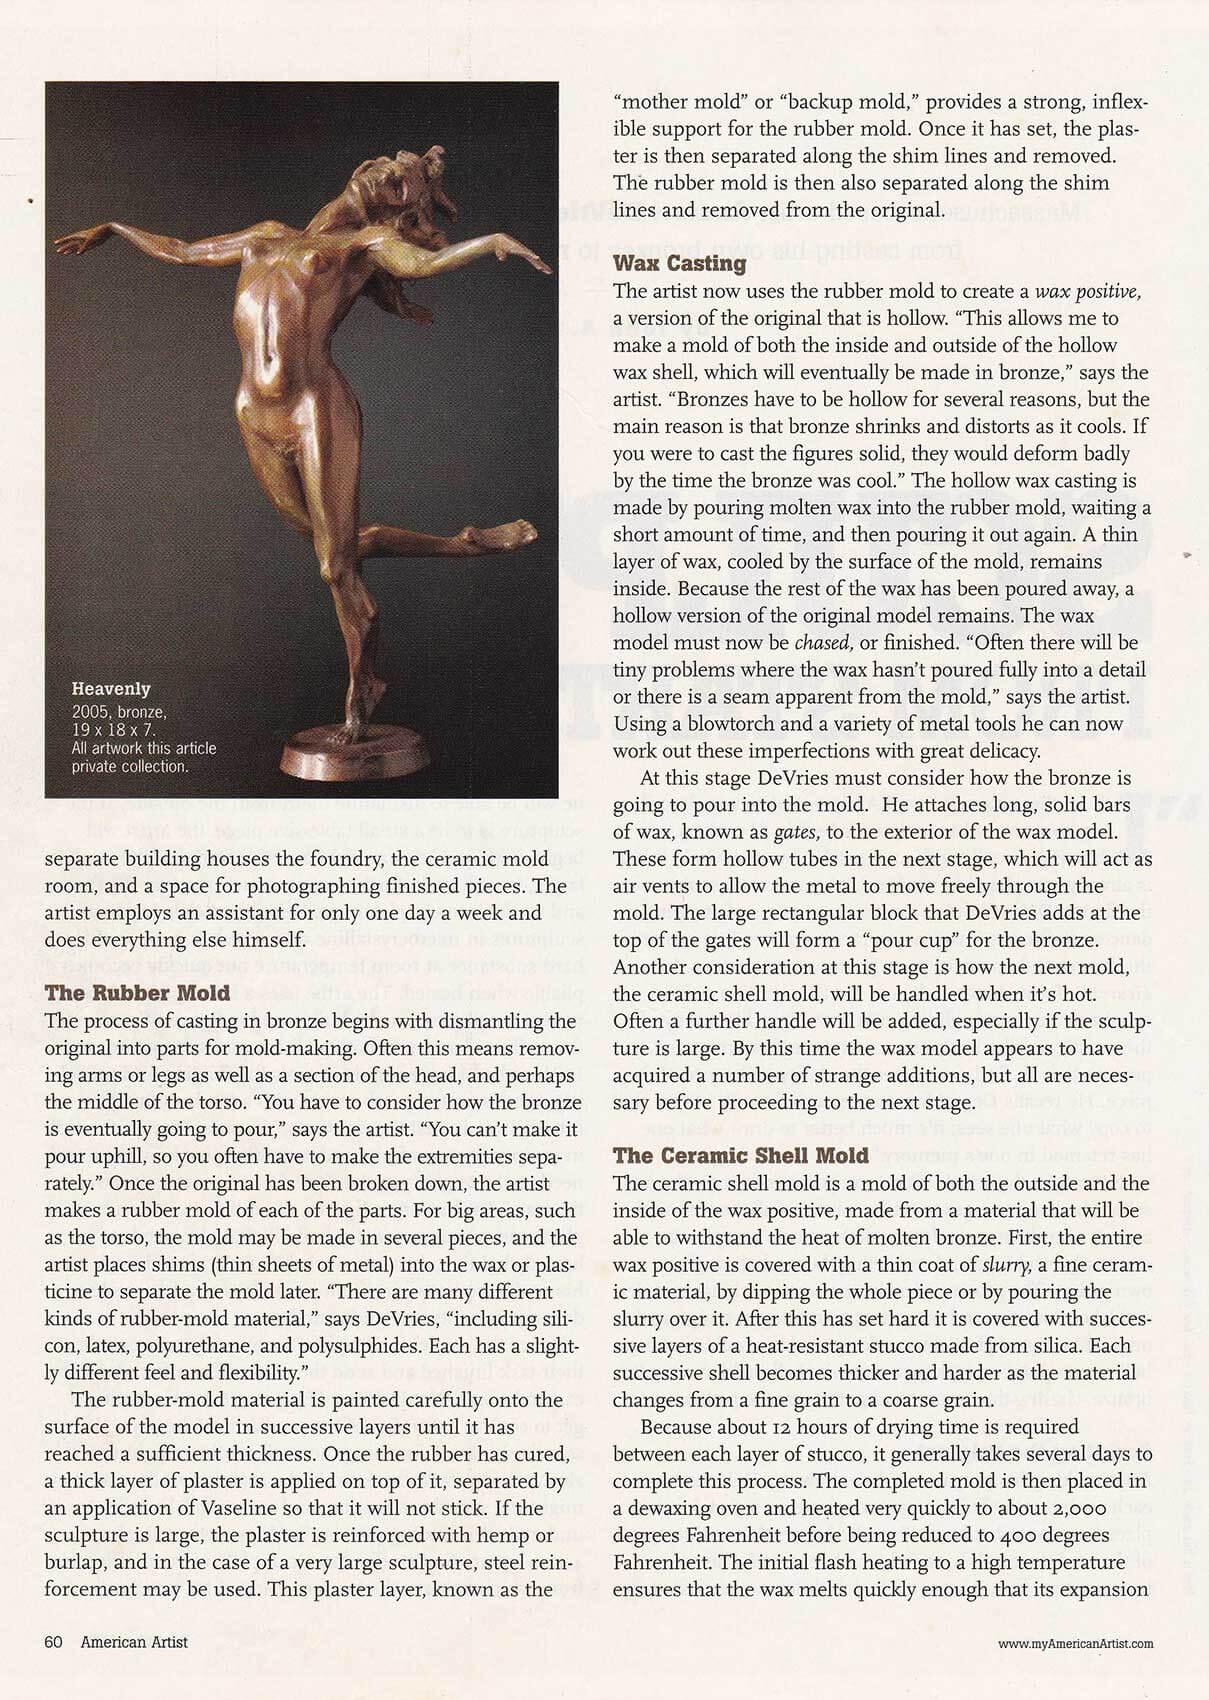 American Artist magazine December 2007page 60